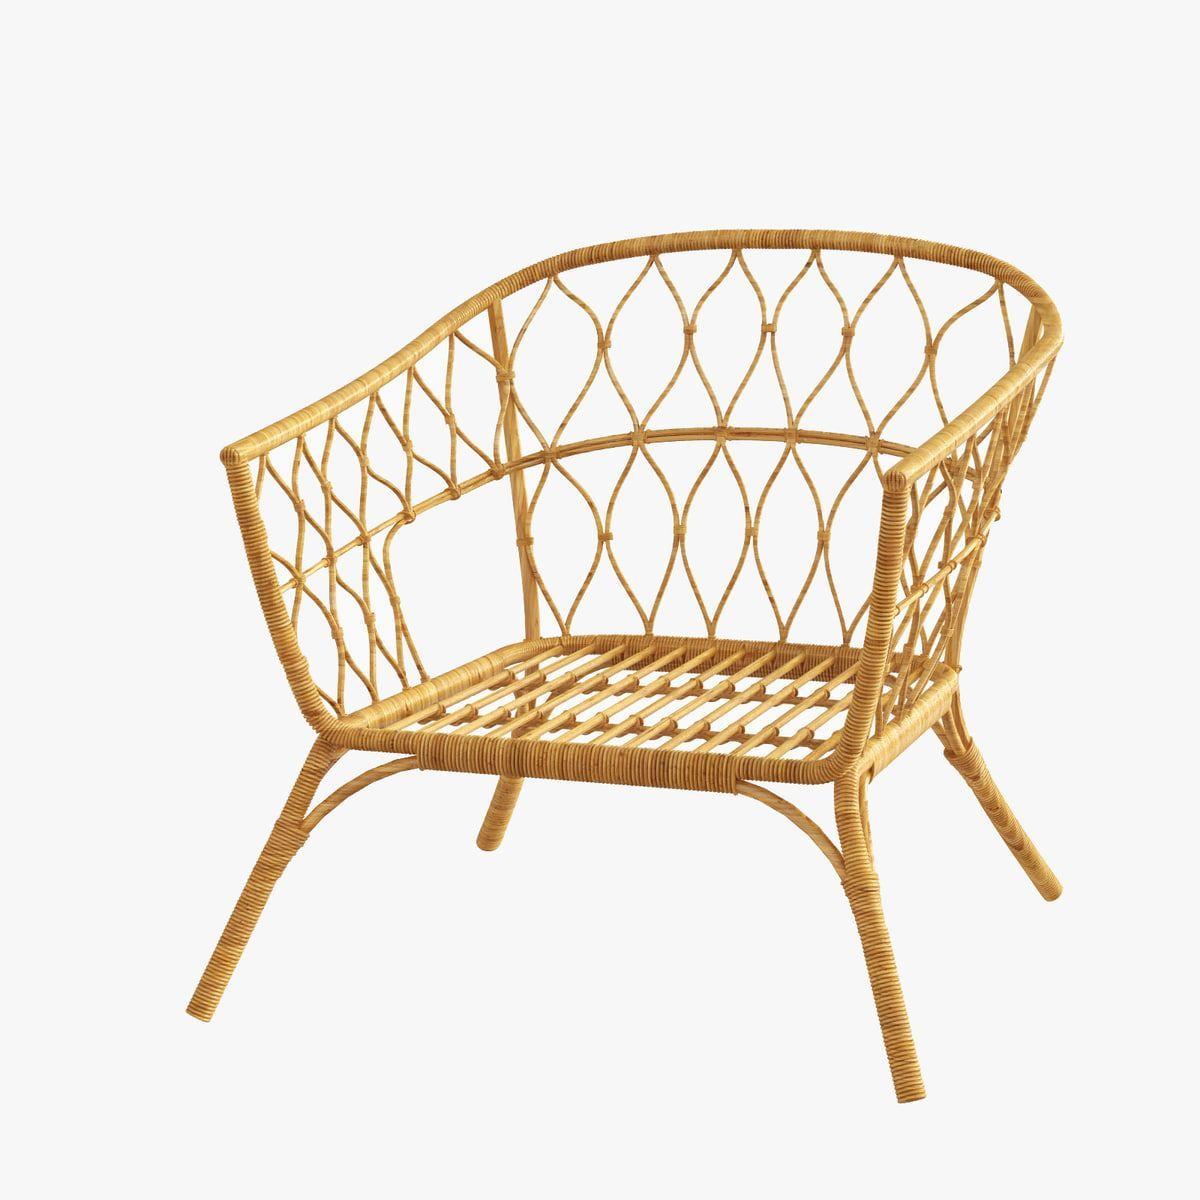 Superbe 3D Rattan Chair Ikea Stockholm   3D Model #RattanChair